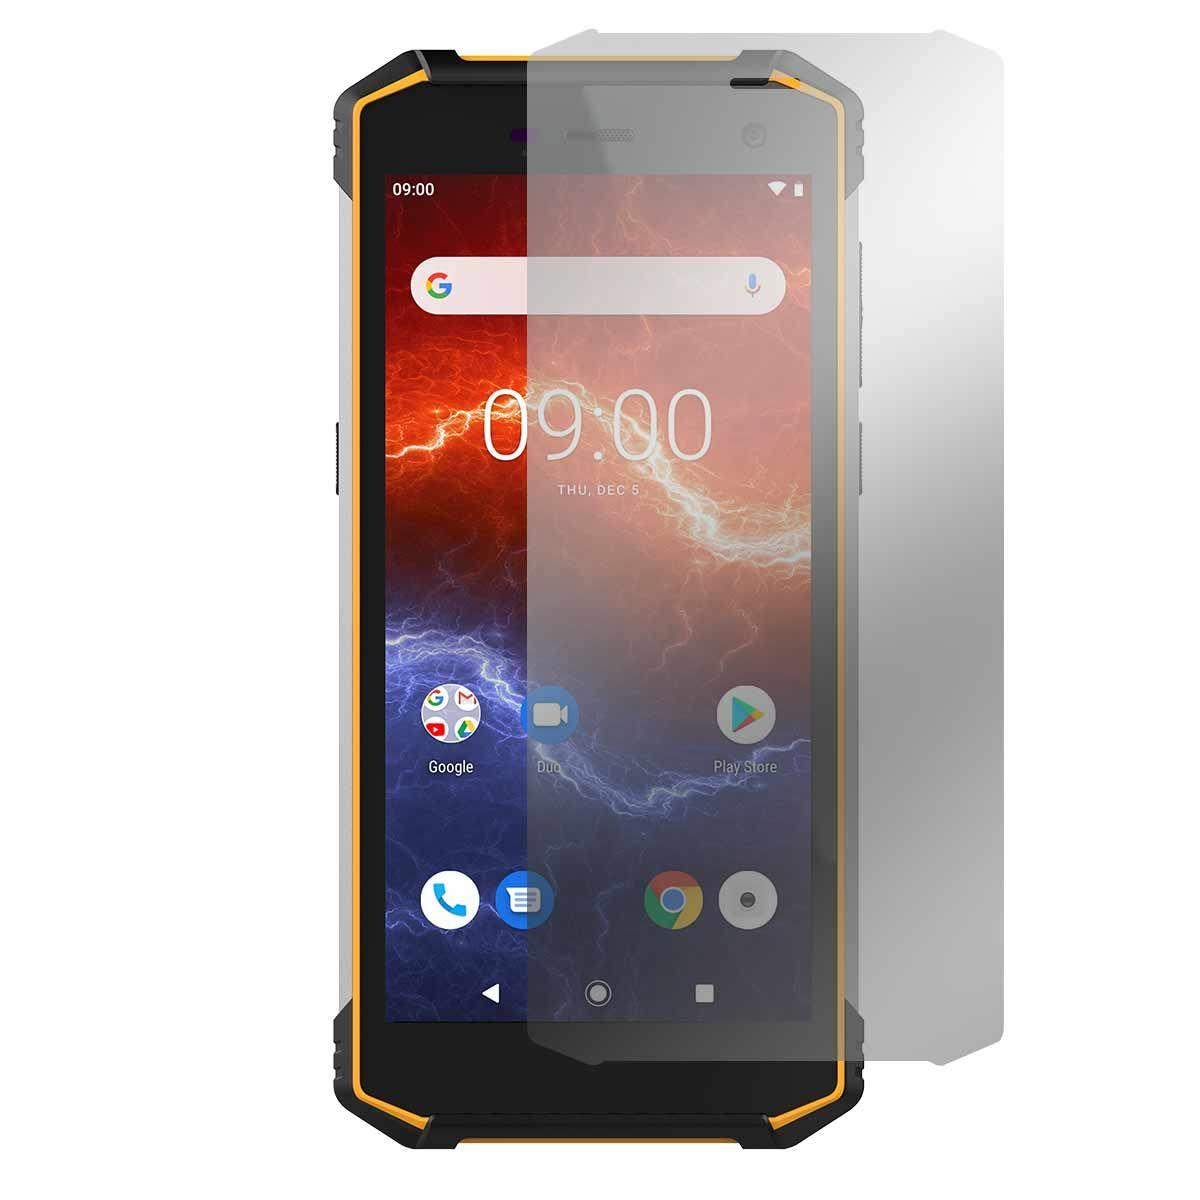 Tvrzené sklo na displej pro myPhone Hammer Energy 2